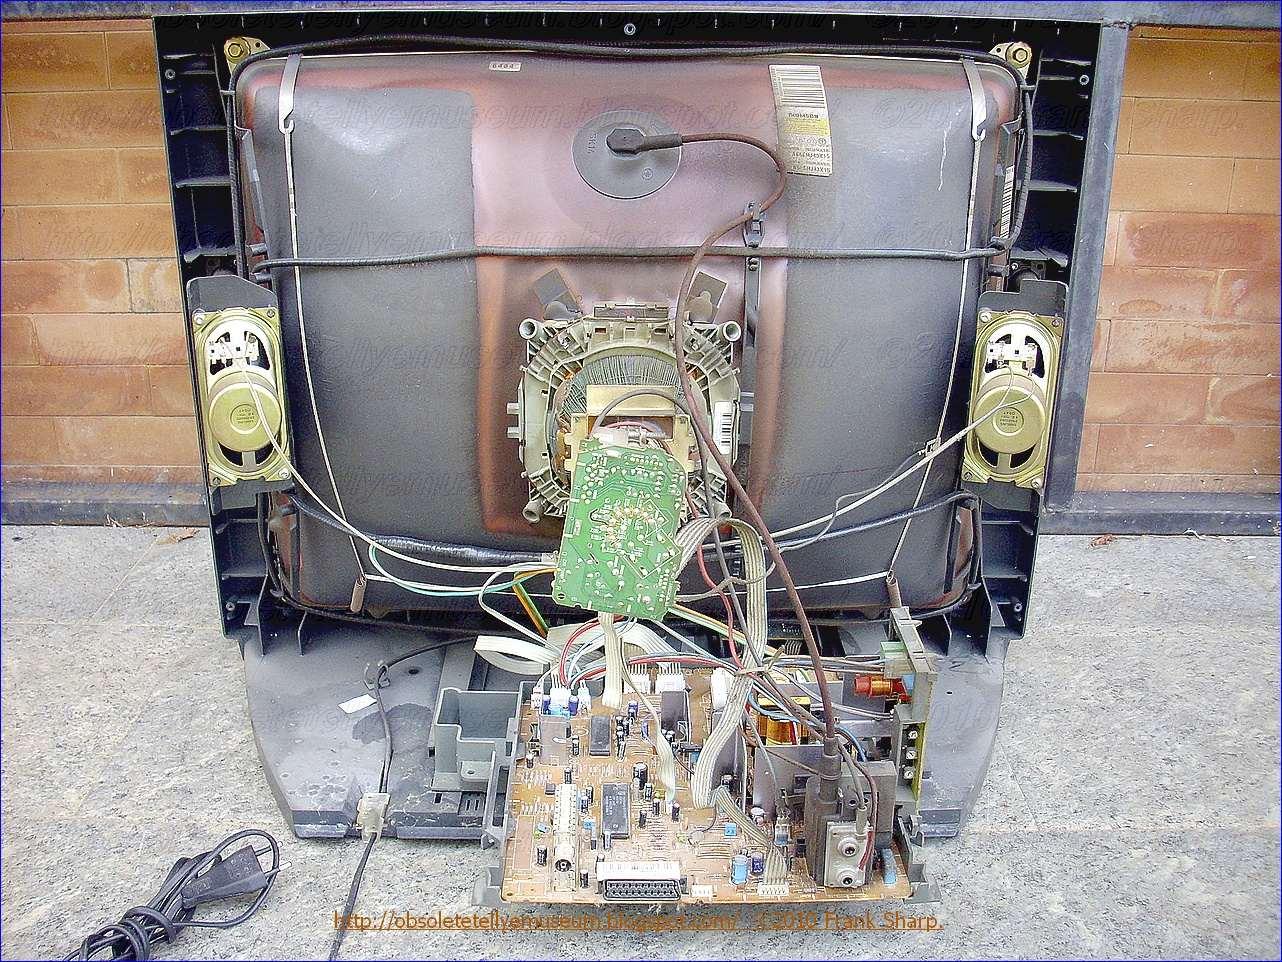 wiring diagram on spa obsolete technology tellye thomson 28dg17e blackpearl 413 on spa motor  [ 1282 x 962 Pixel ]